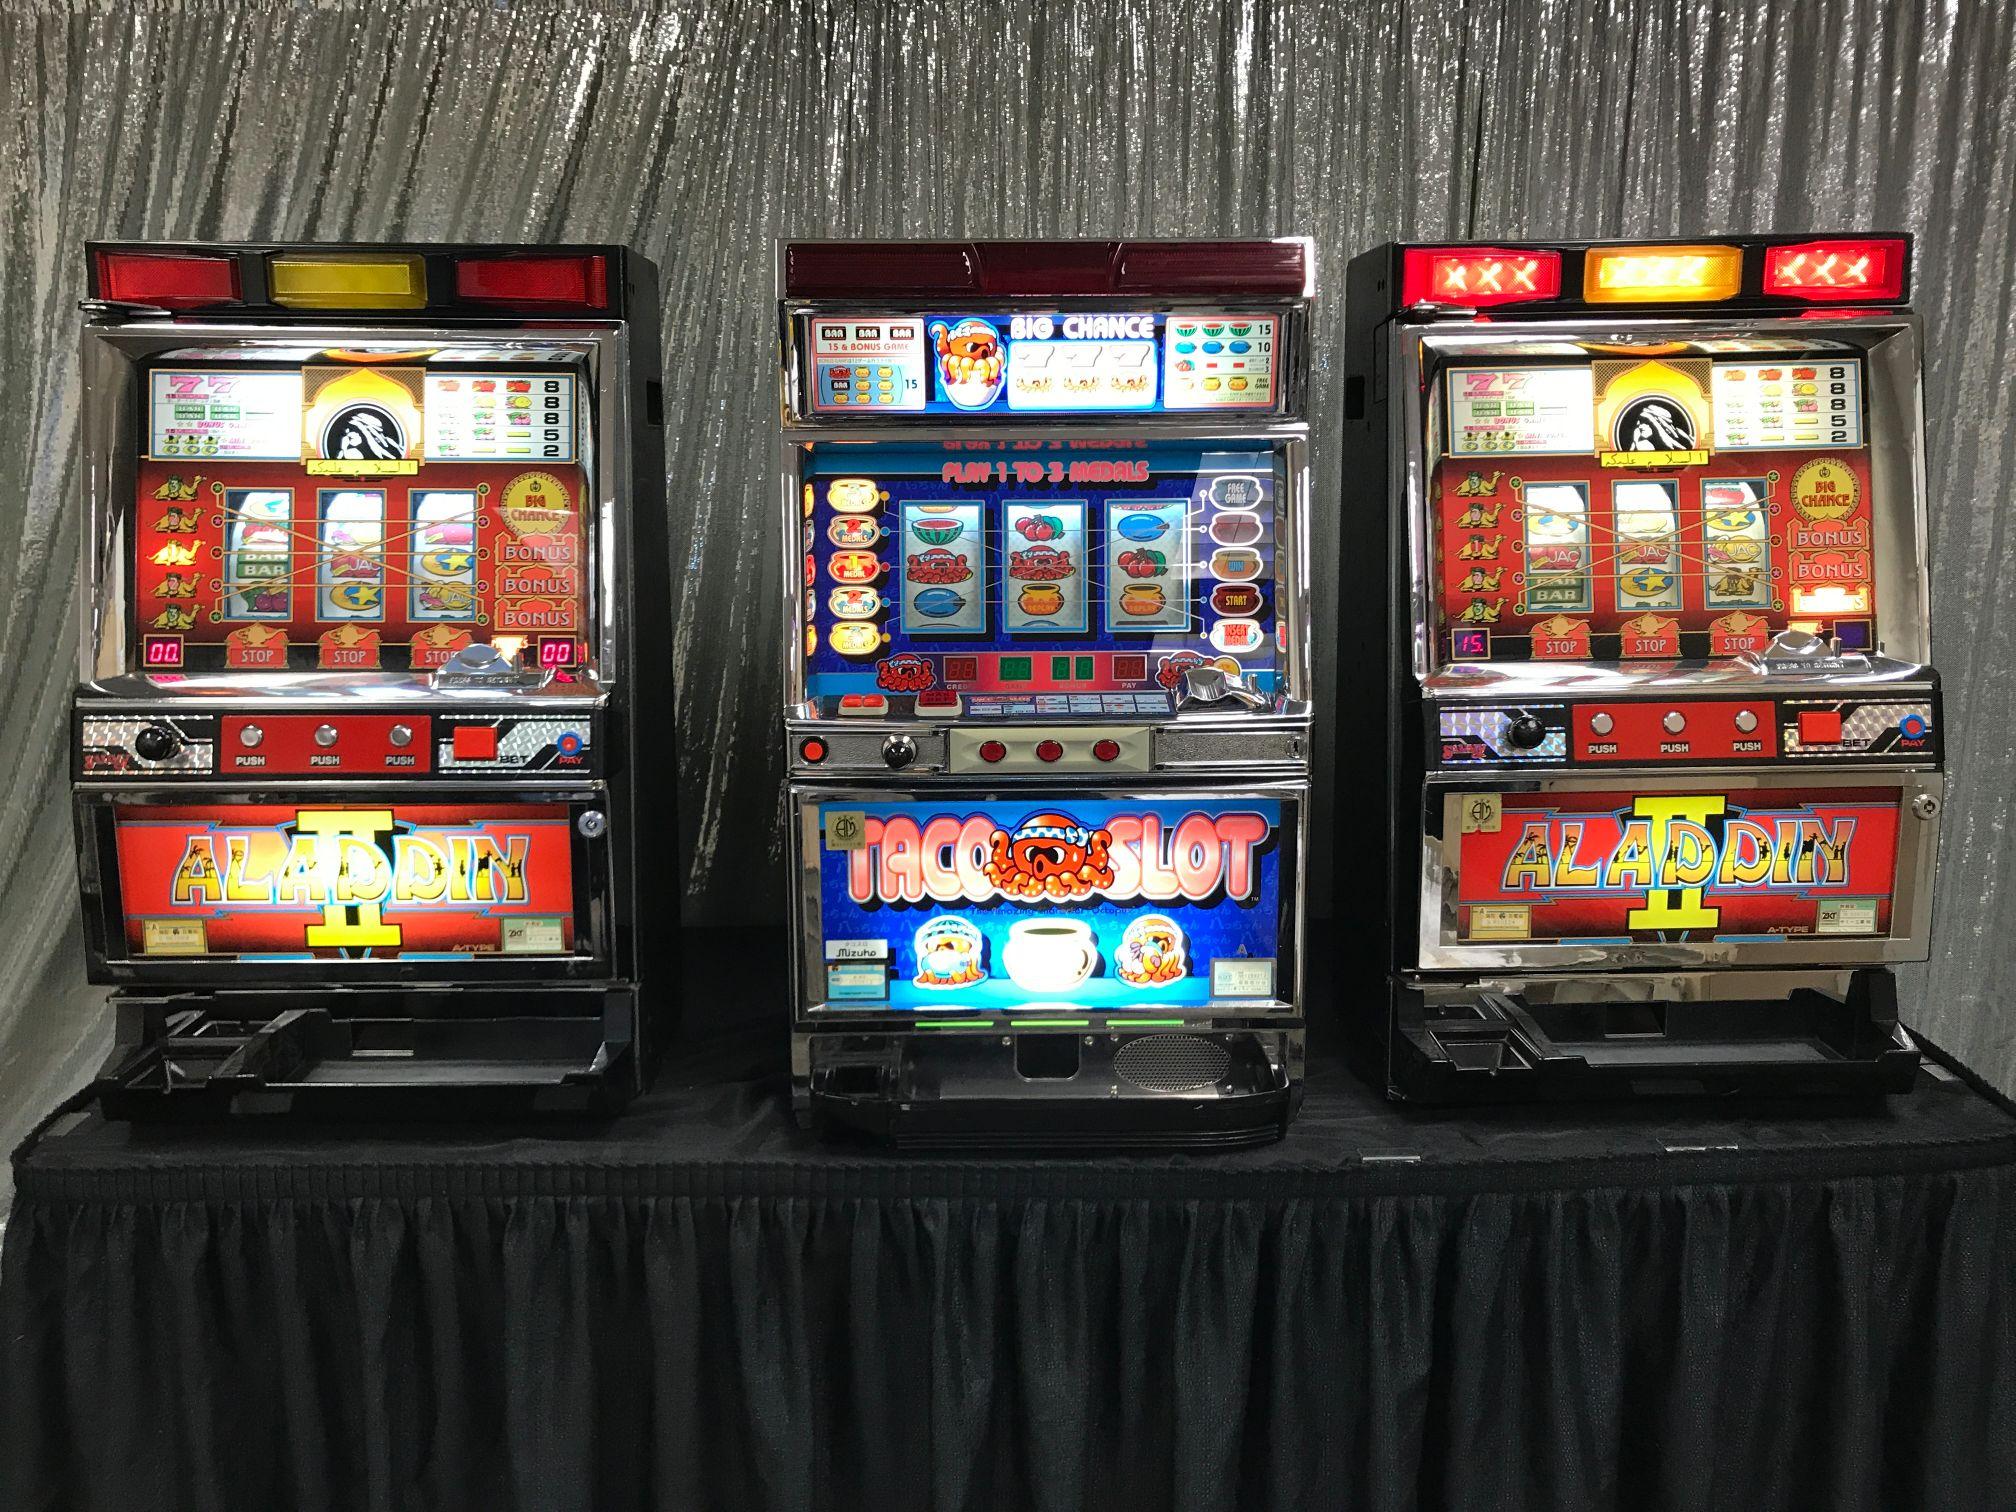 gta online slot machine odds